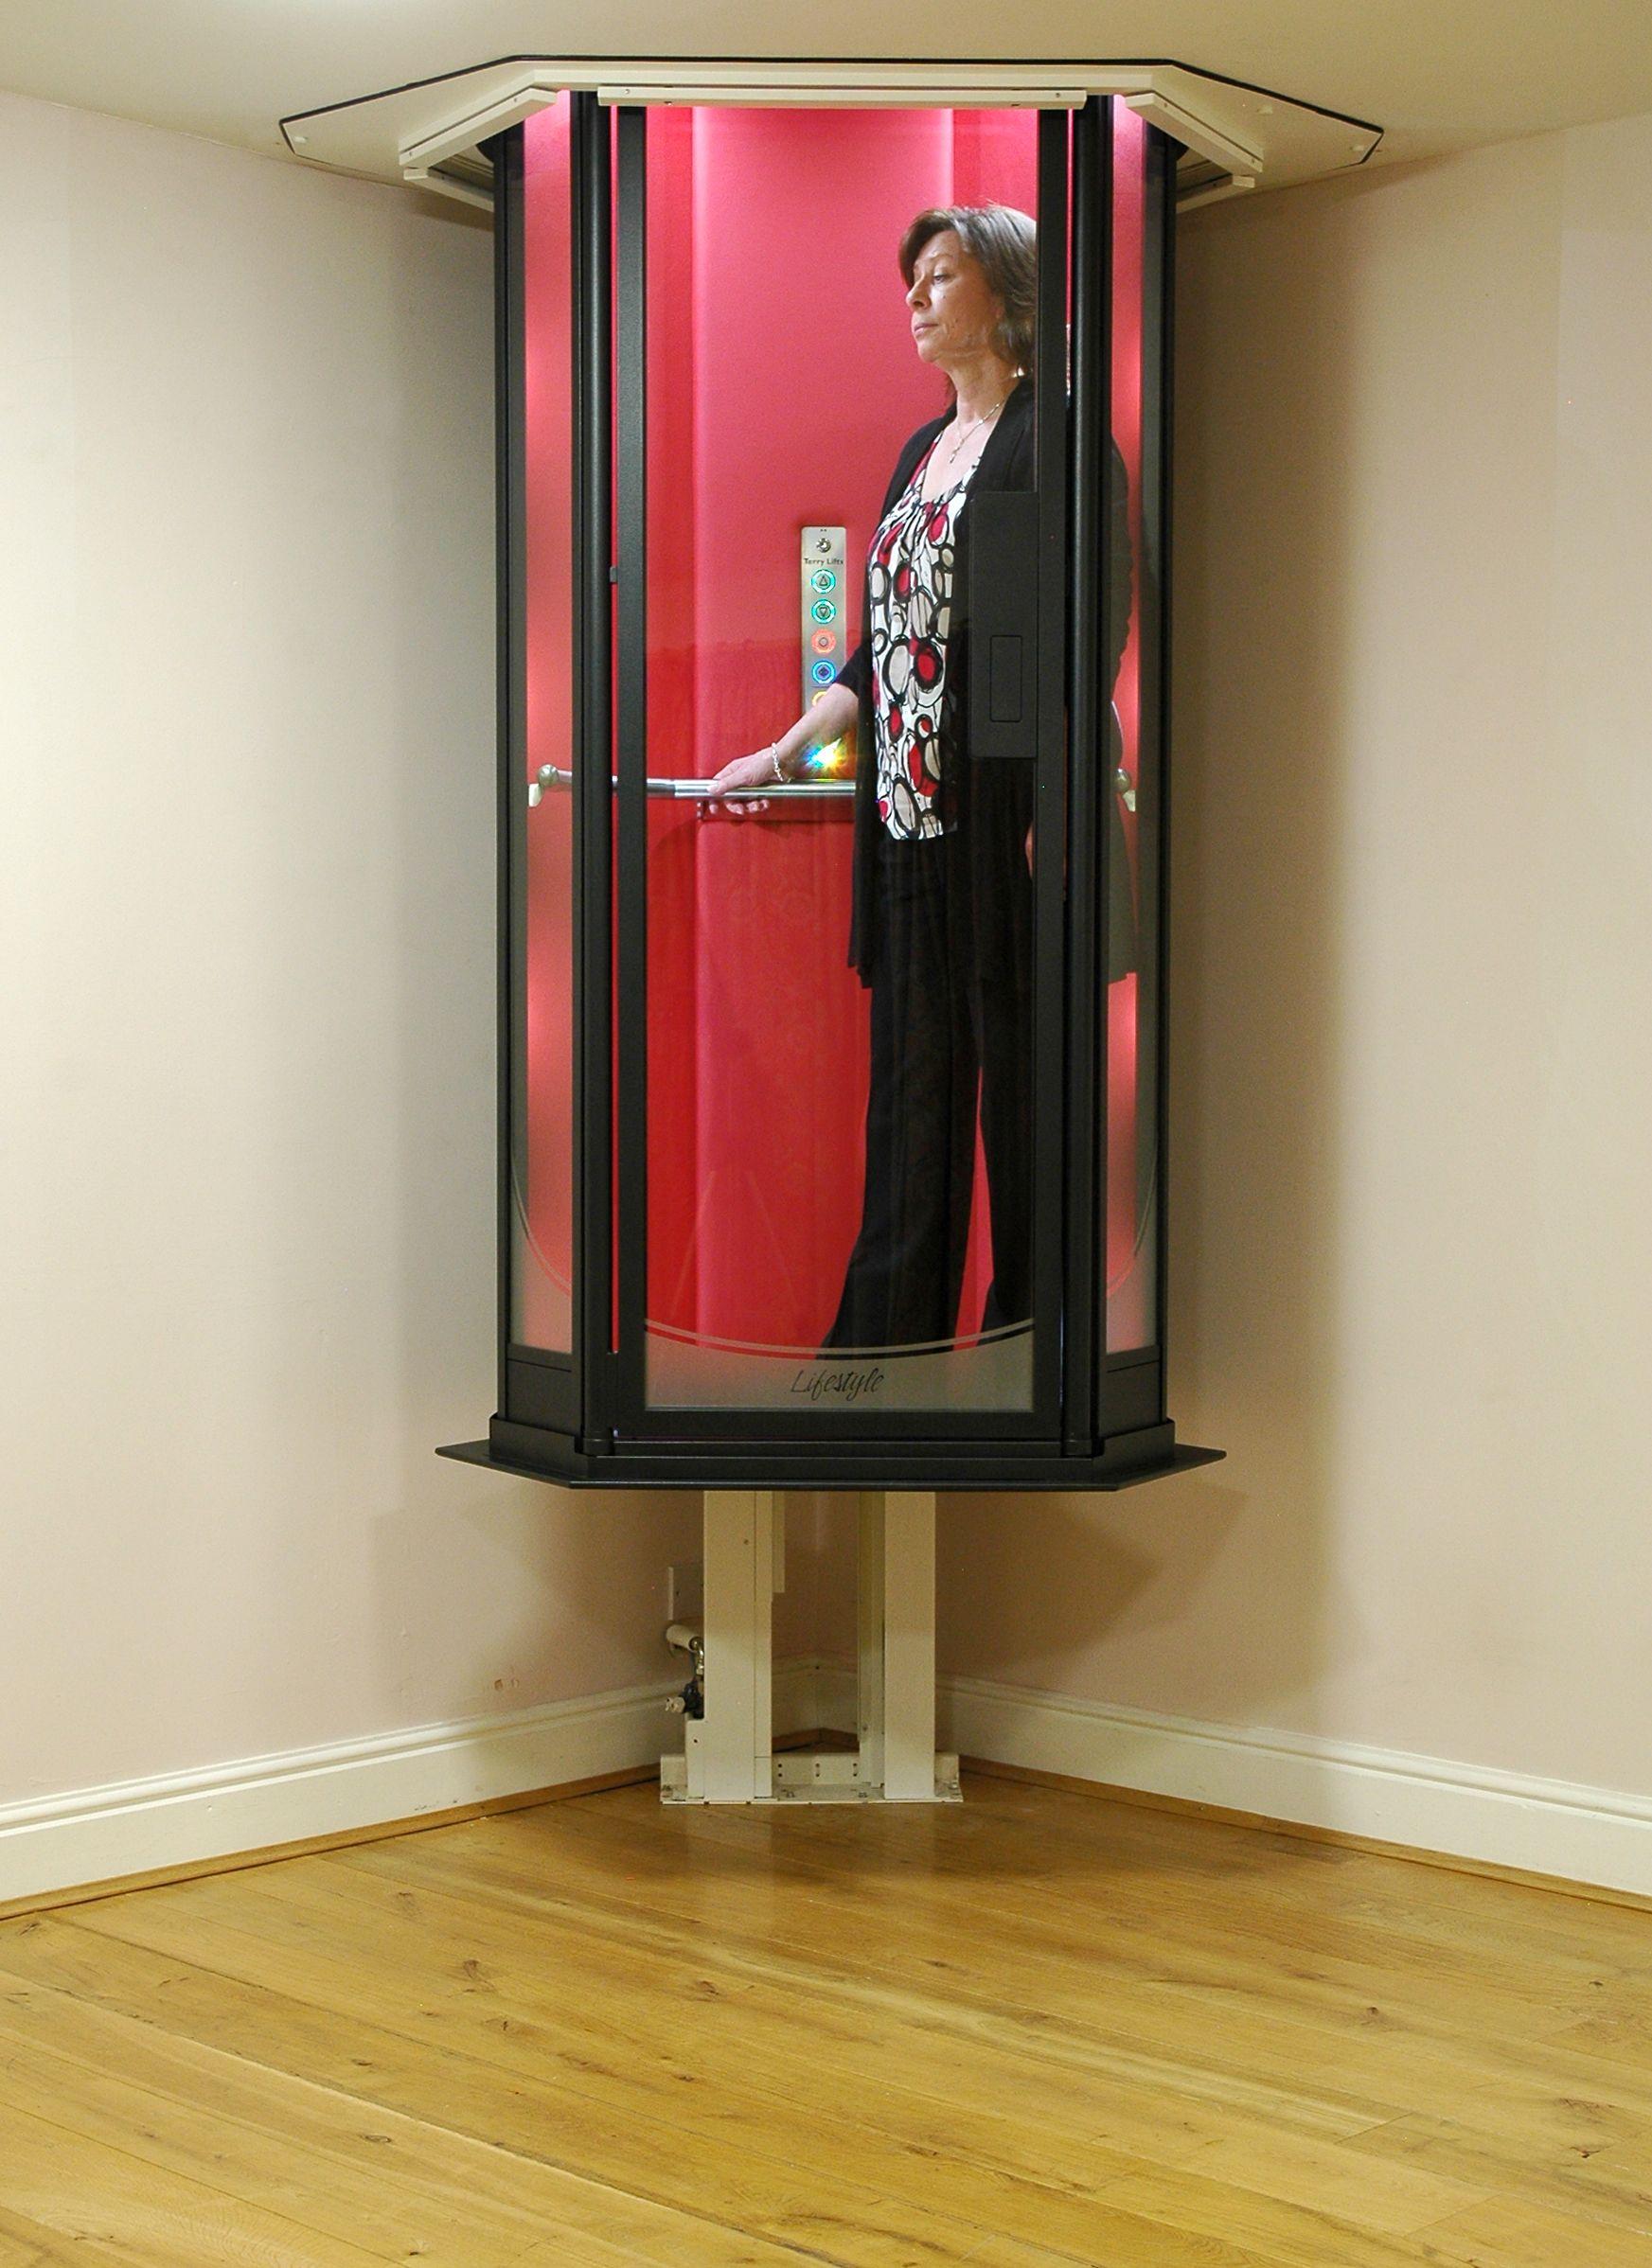 Lifestyle Home Lift The Luxury Through Floor Elevator Huis Ideeen Architectuur Huis Huis Interieur